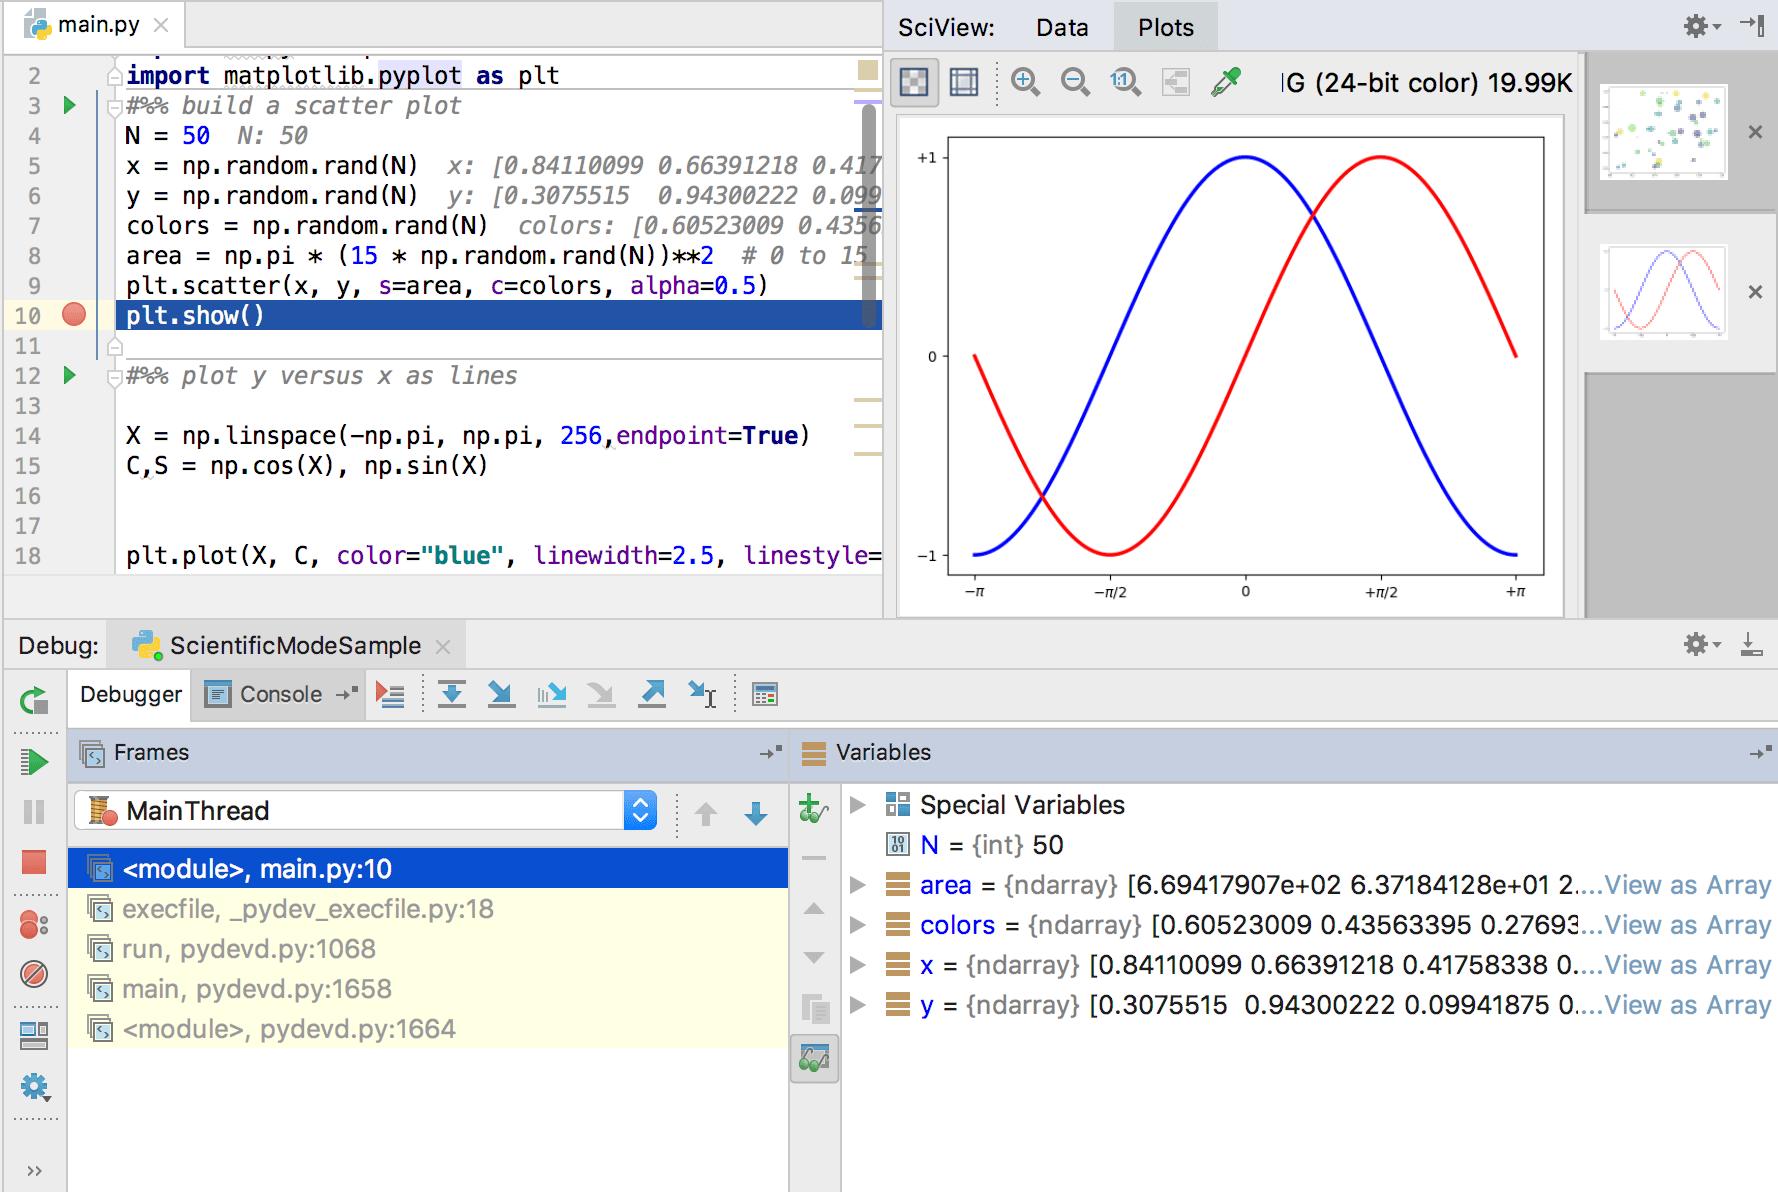 Debugging the matplotlib code